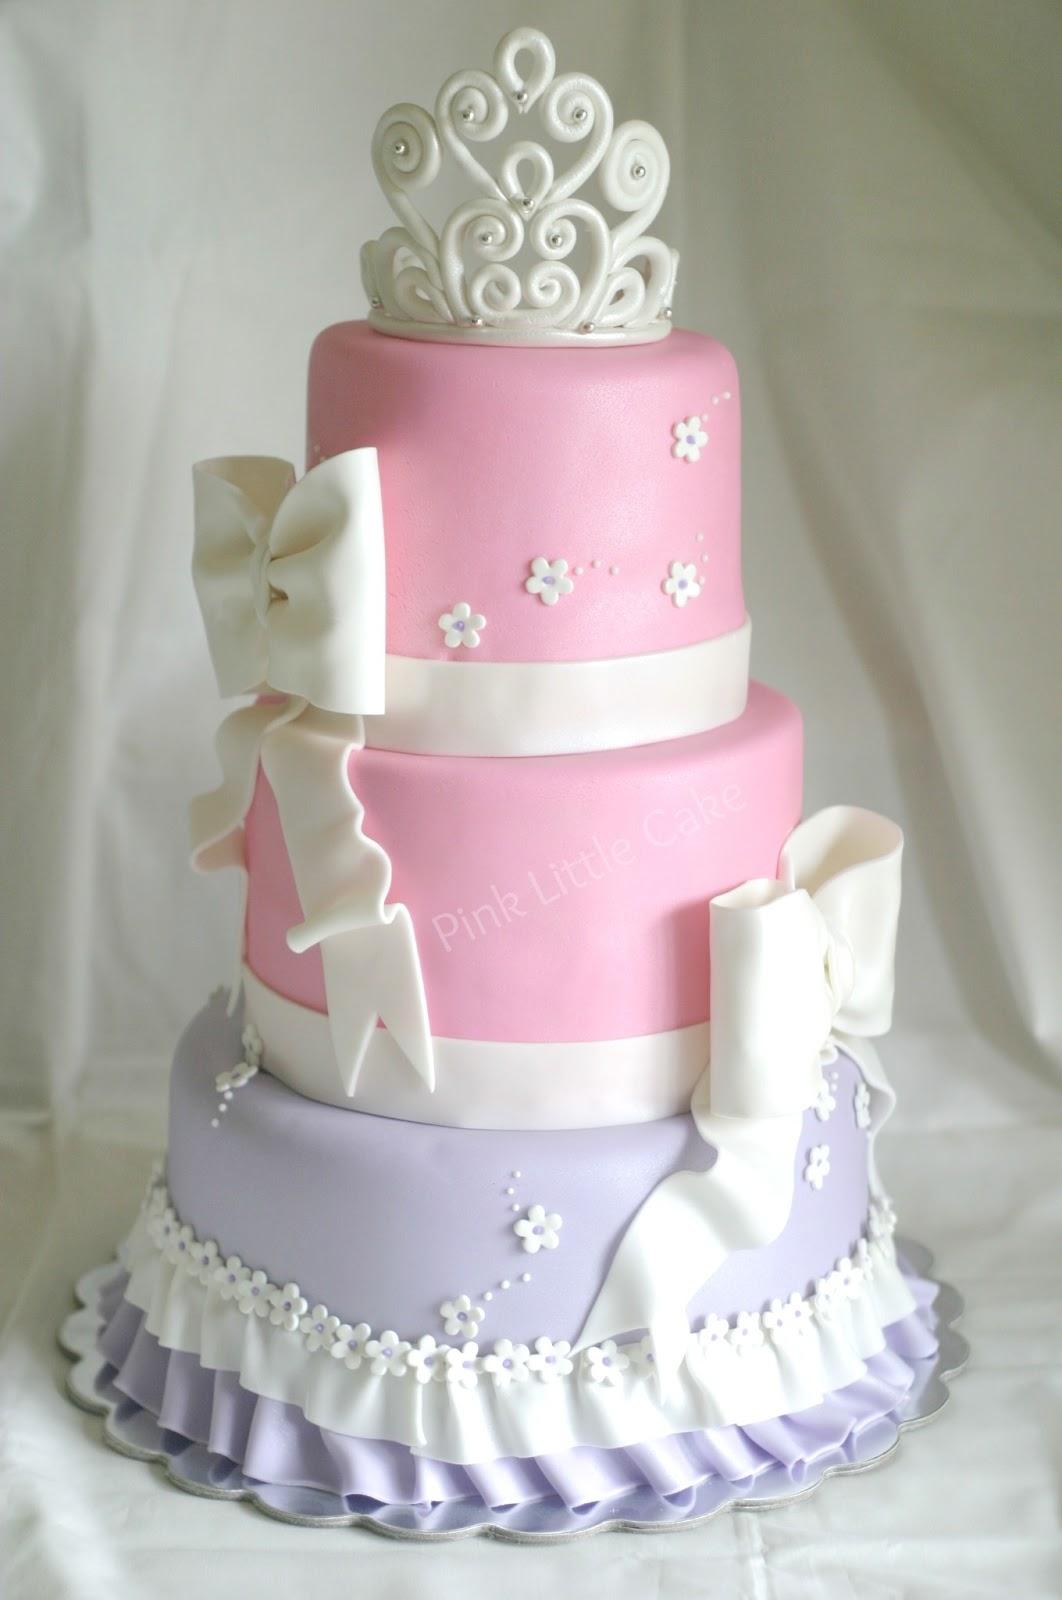 Pink Little Cake July 2012